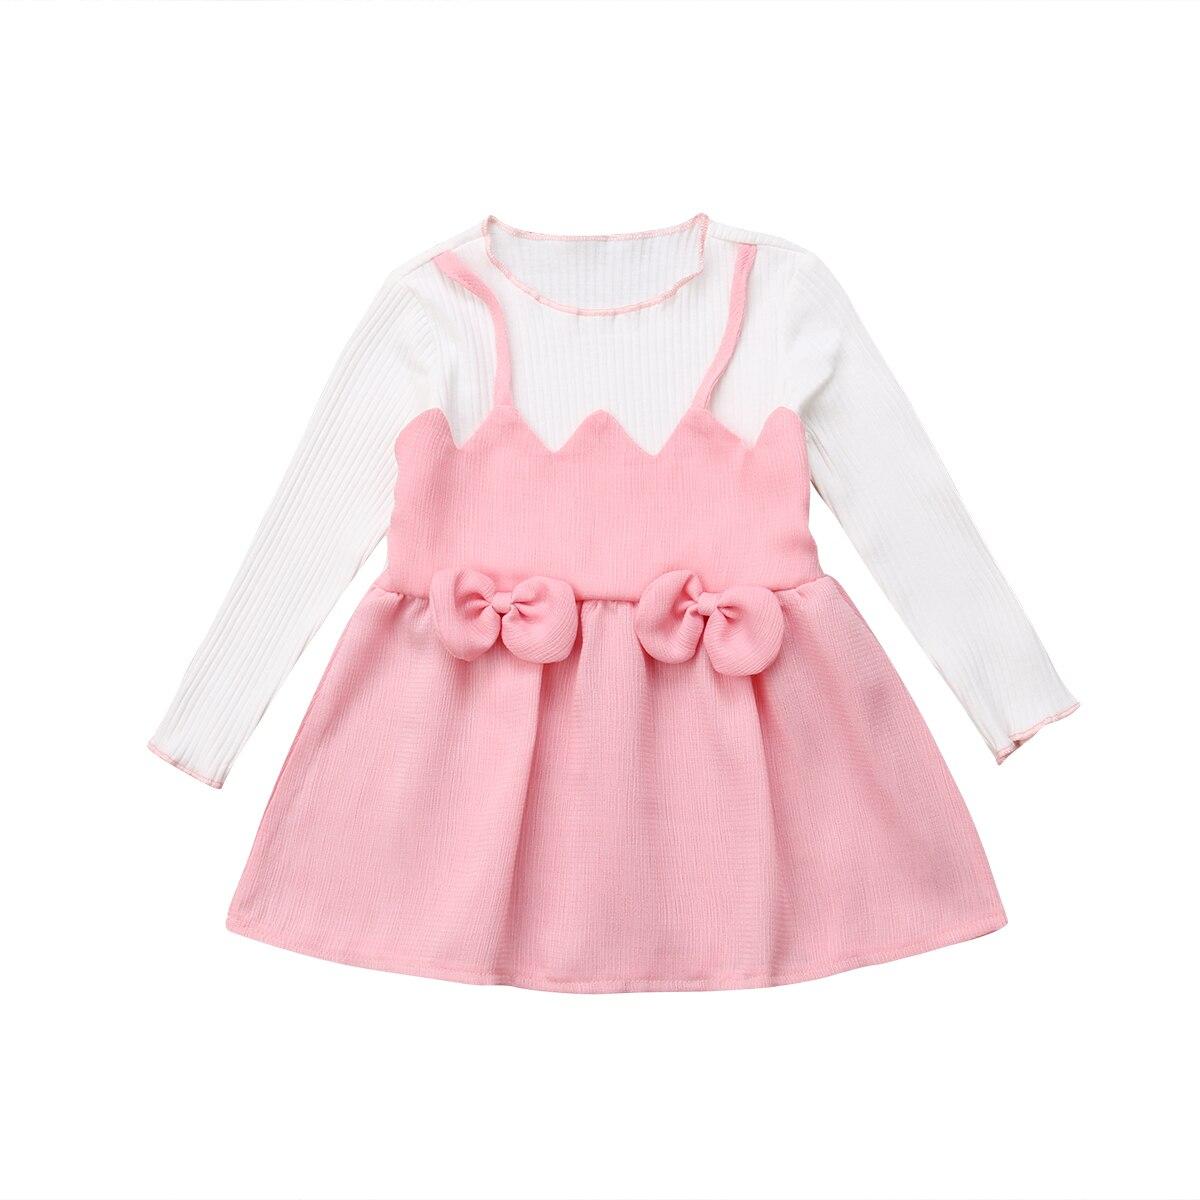 Autumn Long Sleeve Pink Dress Cute Toddler Kid Baby Girls ...